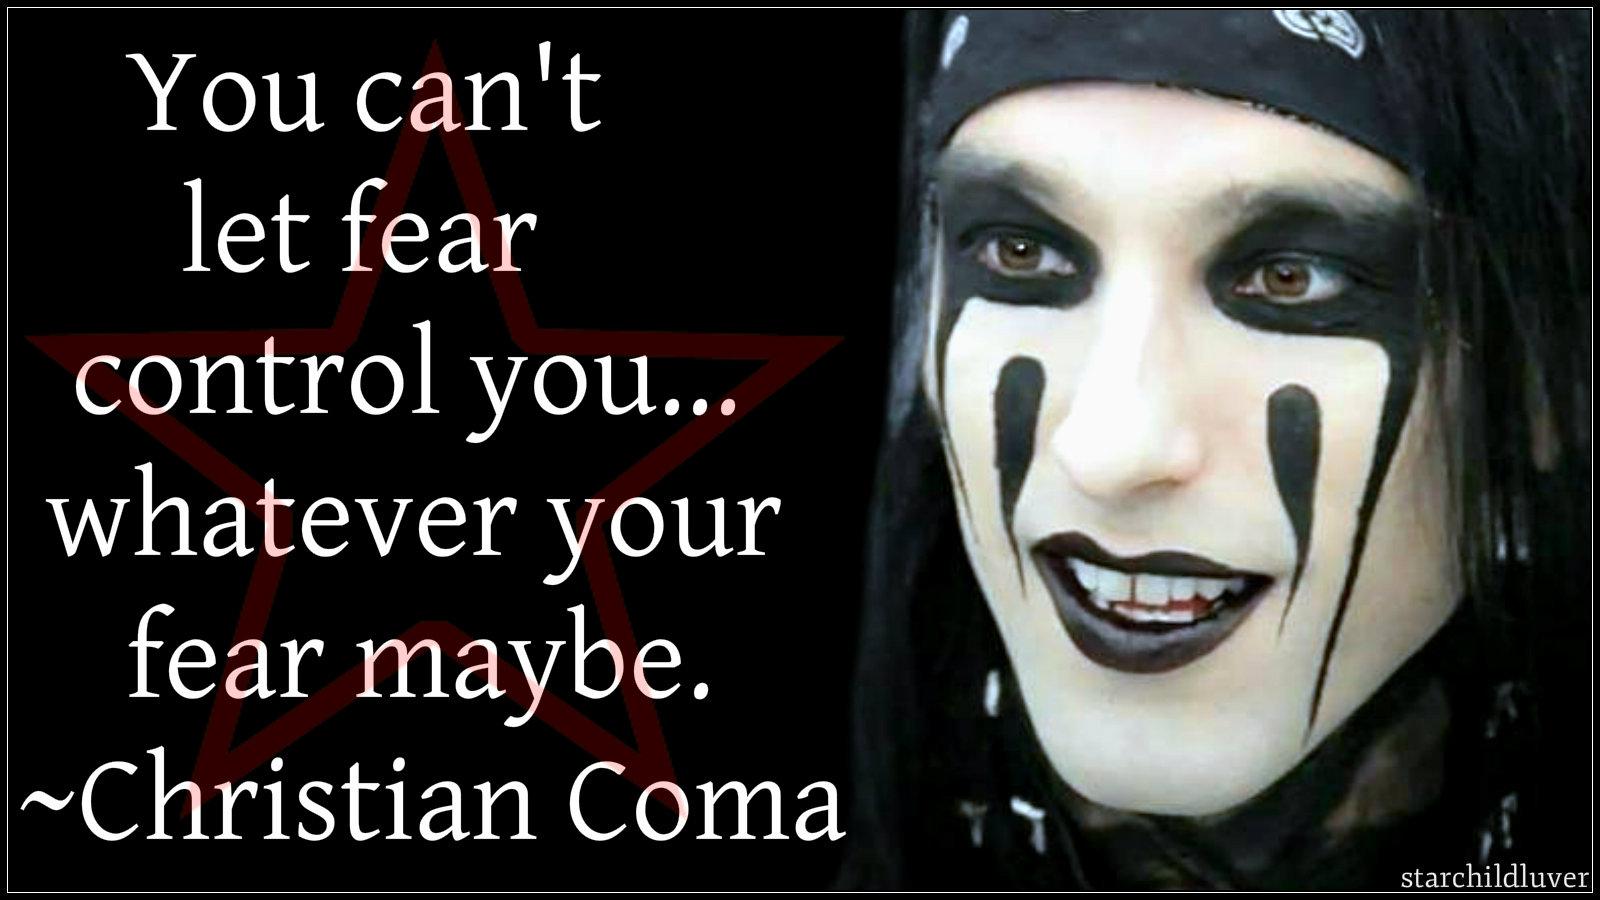 Bvb Christian Coma Quotes Inspirational. QuotesGram